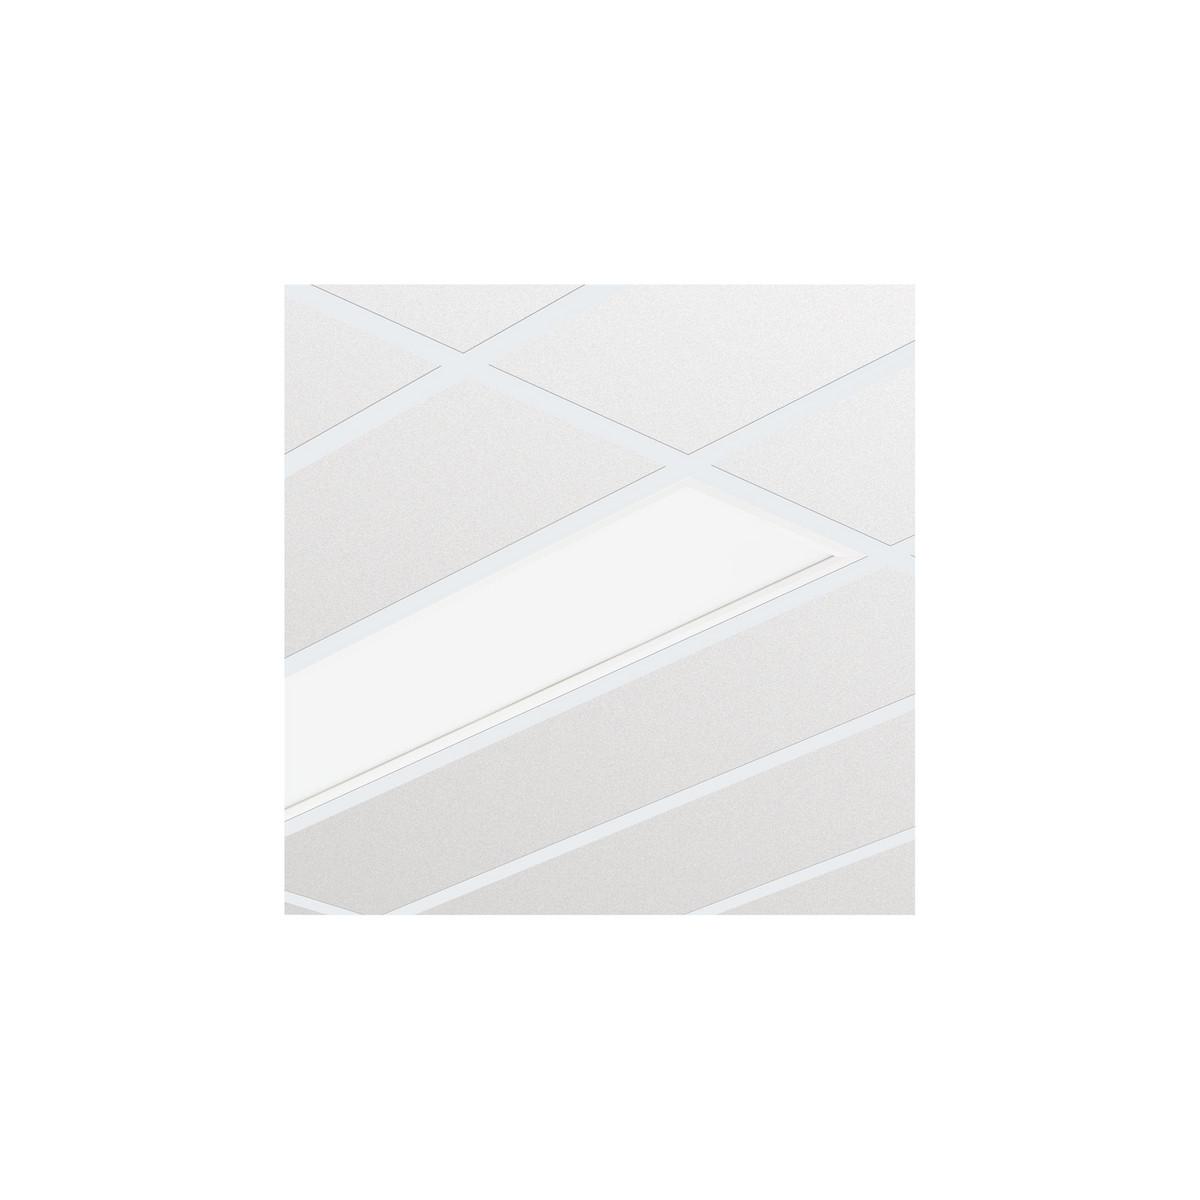 CoreLine Panel RC132V Gen3 LED 3600lm/840 35W DALI 30x120 OC/UGR<19